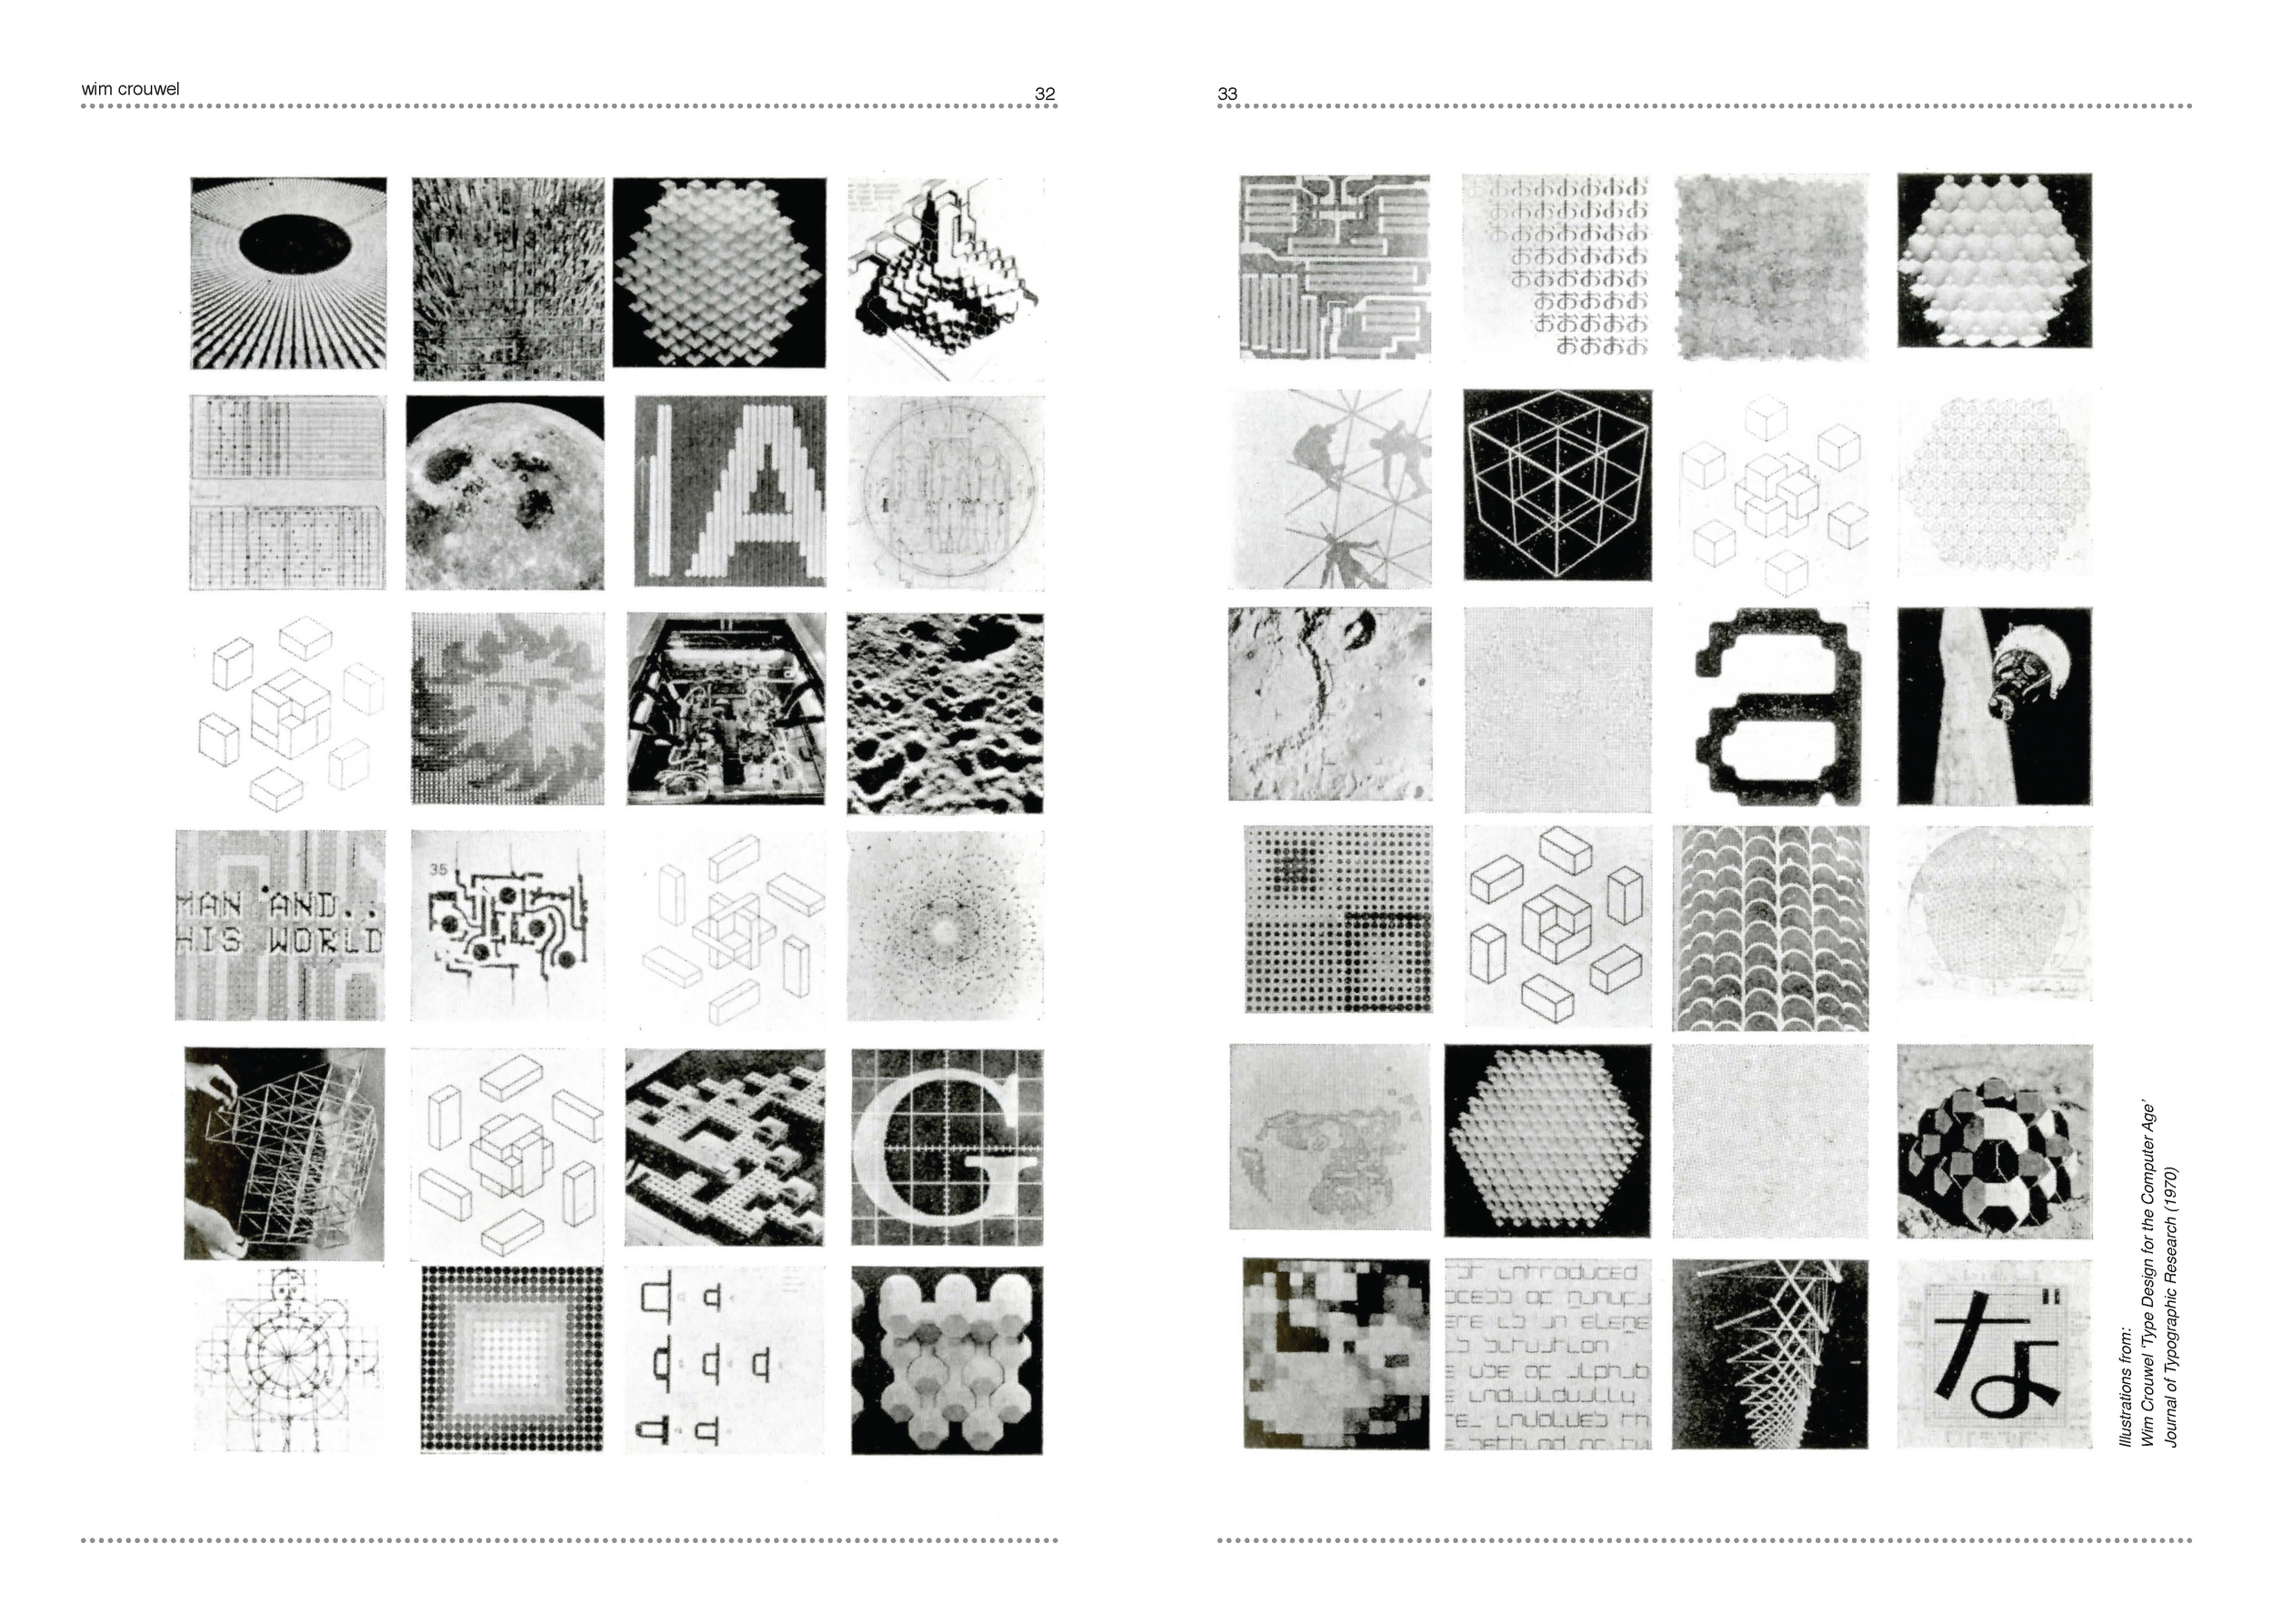 wim_crouwel_booklet copy_Page_17.png